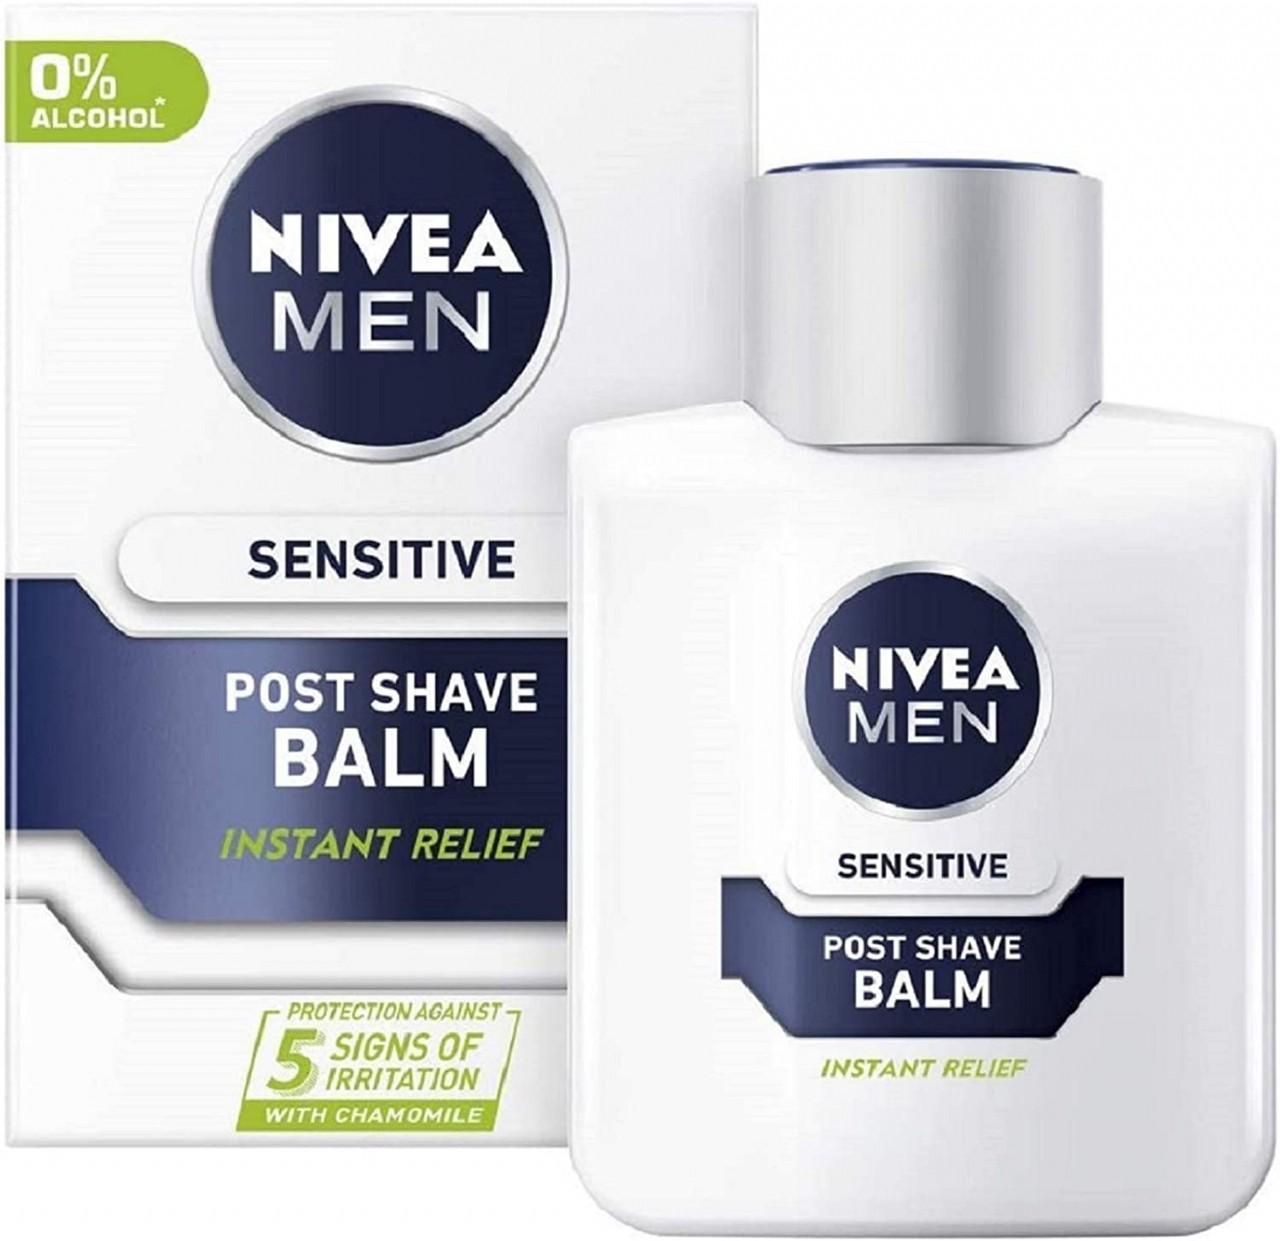 Nivea Men NIVEA FOR MEN Sensitive Post Shave Balm, 3.3 Ounce (Pack of 1) (thomaswi)